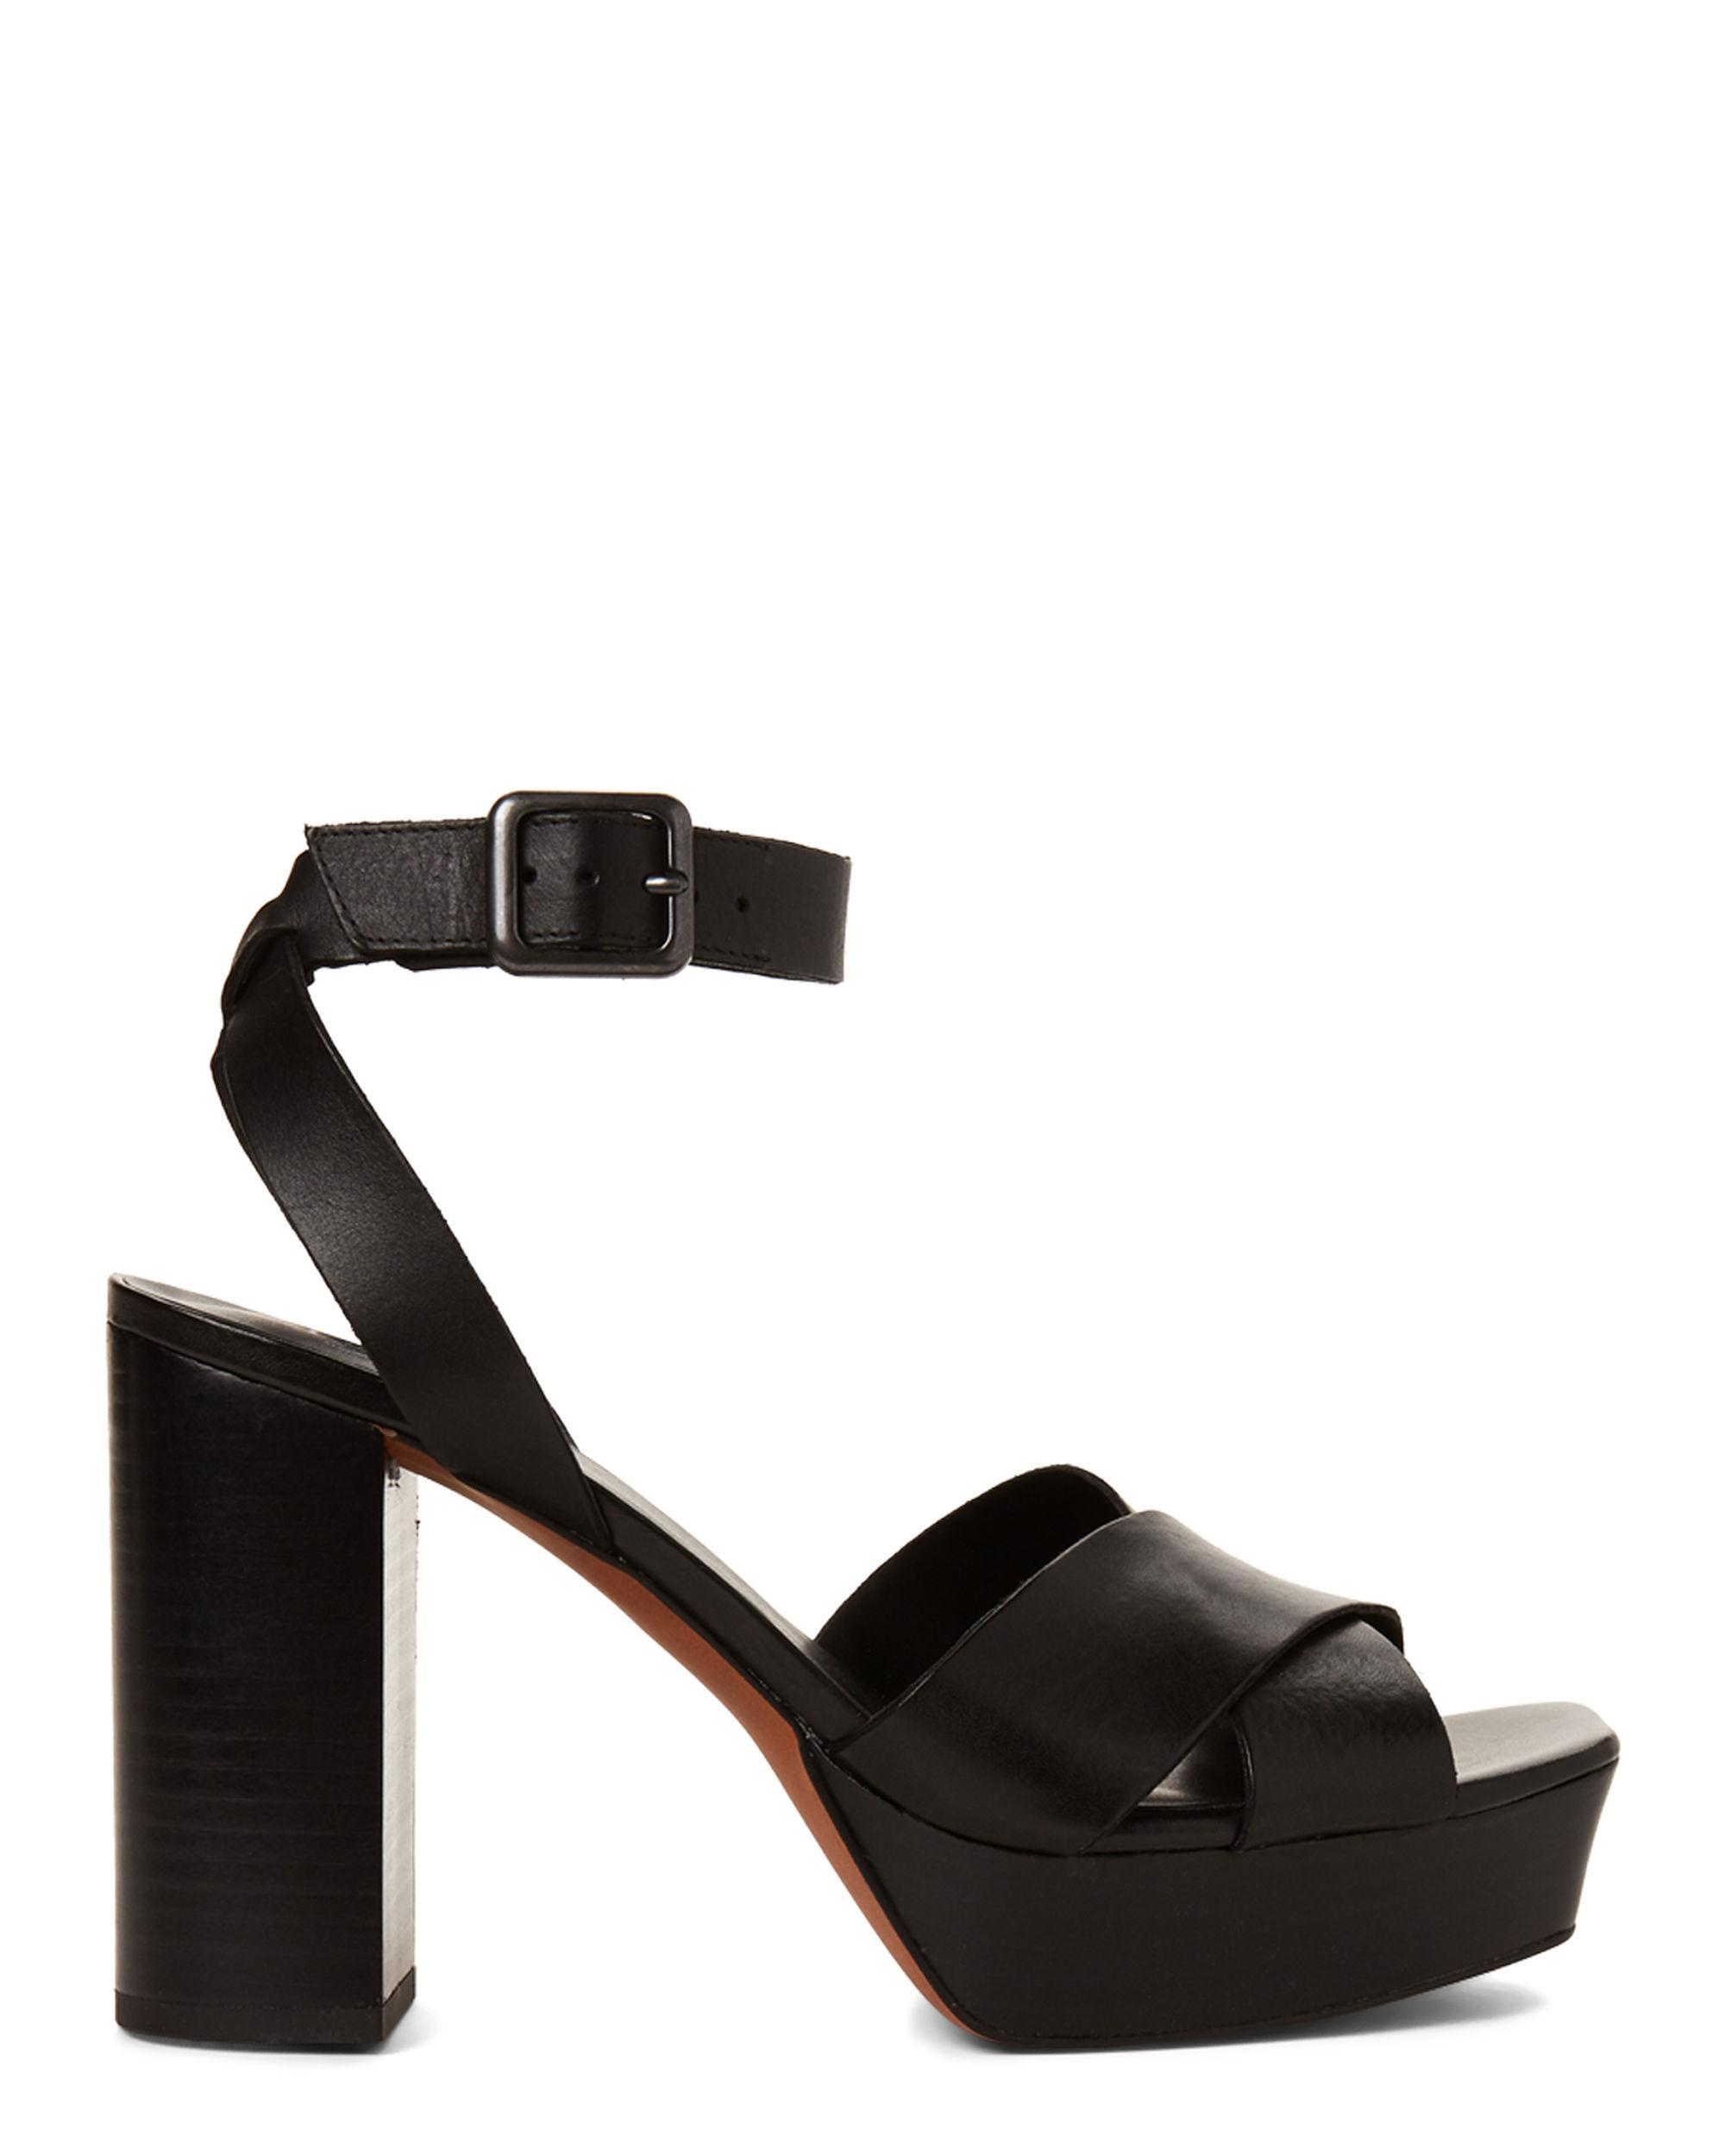 9e646f639be2 Lyst - Franco Sarto Black Marta Platform Leather Sandals in Black